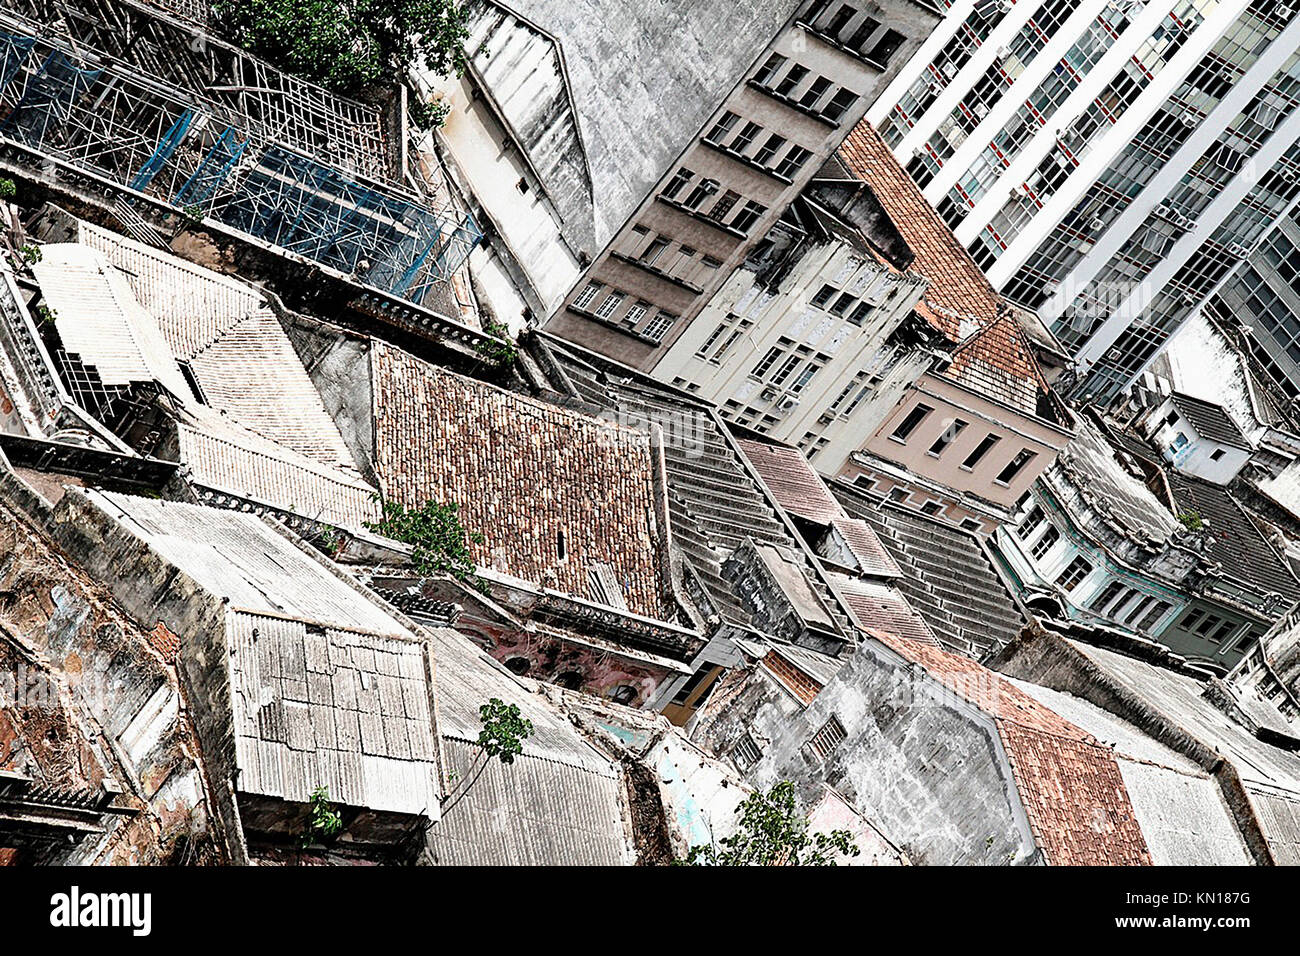 Rundown Building Decay Stock Photos Rundown: Rundown Buildings In Dowtown Salvador De Bahia, Brazil